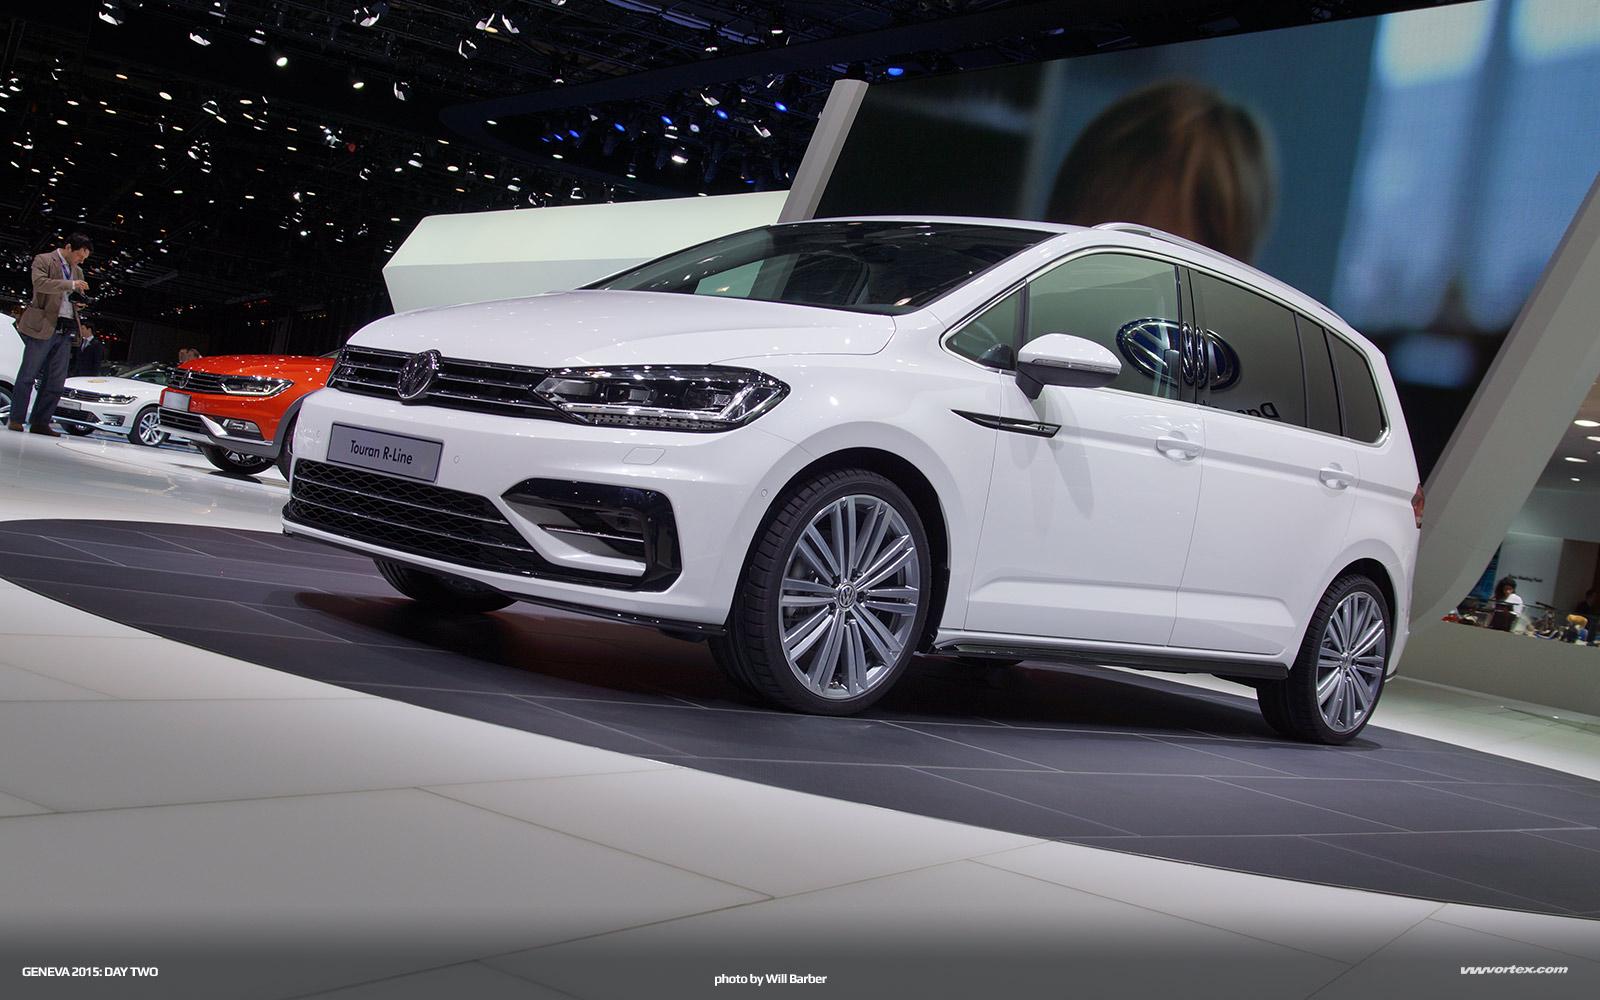 Geneva-2015-Day-Two-Volkswagen-Group-457